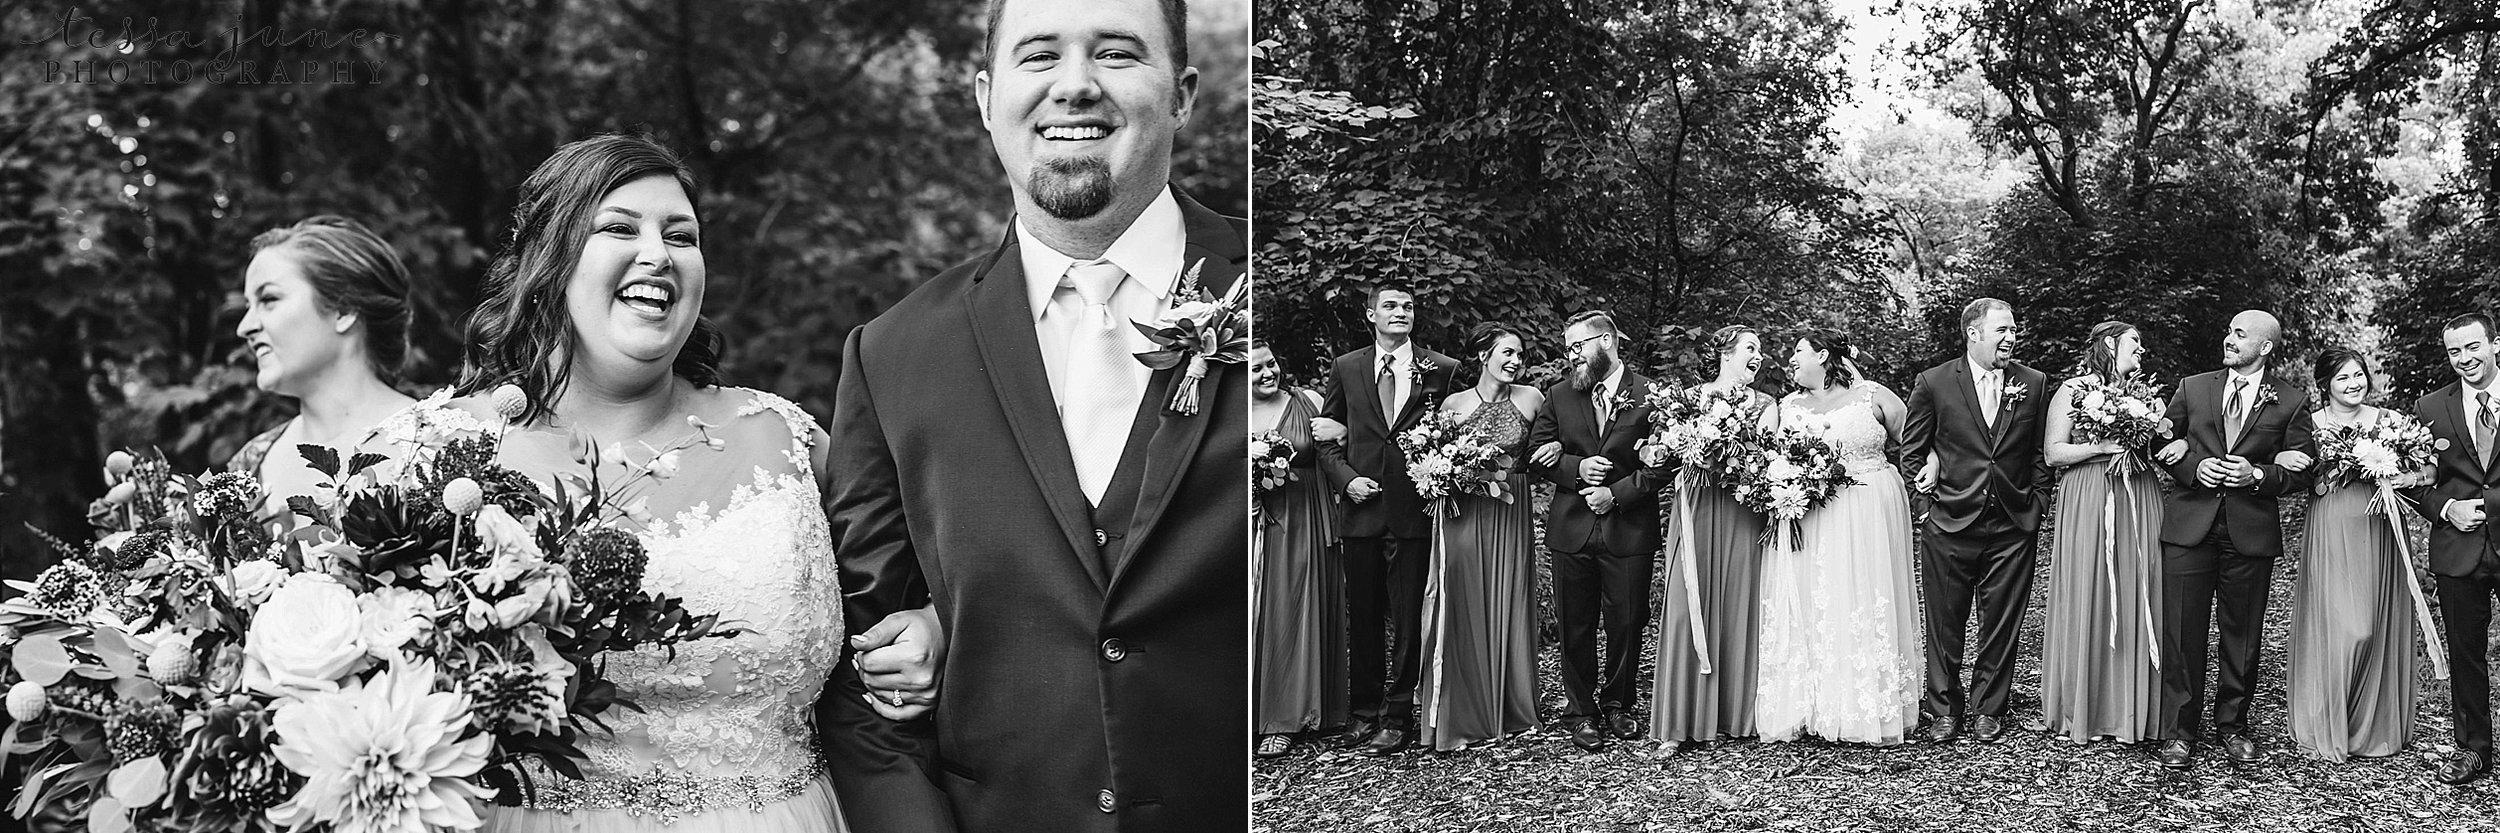 minneapolis-summer-wedding-at-silverwood-park-pristine-floral-76.jpg